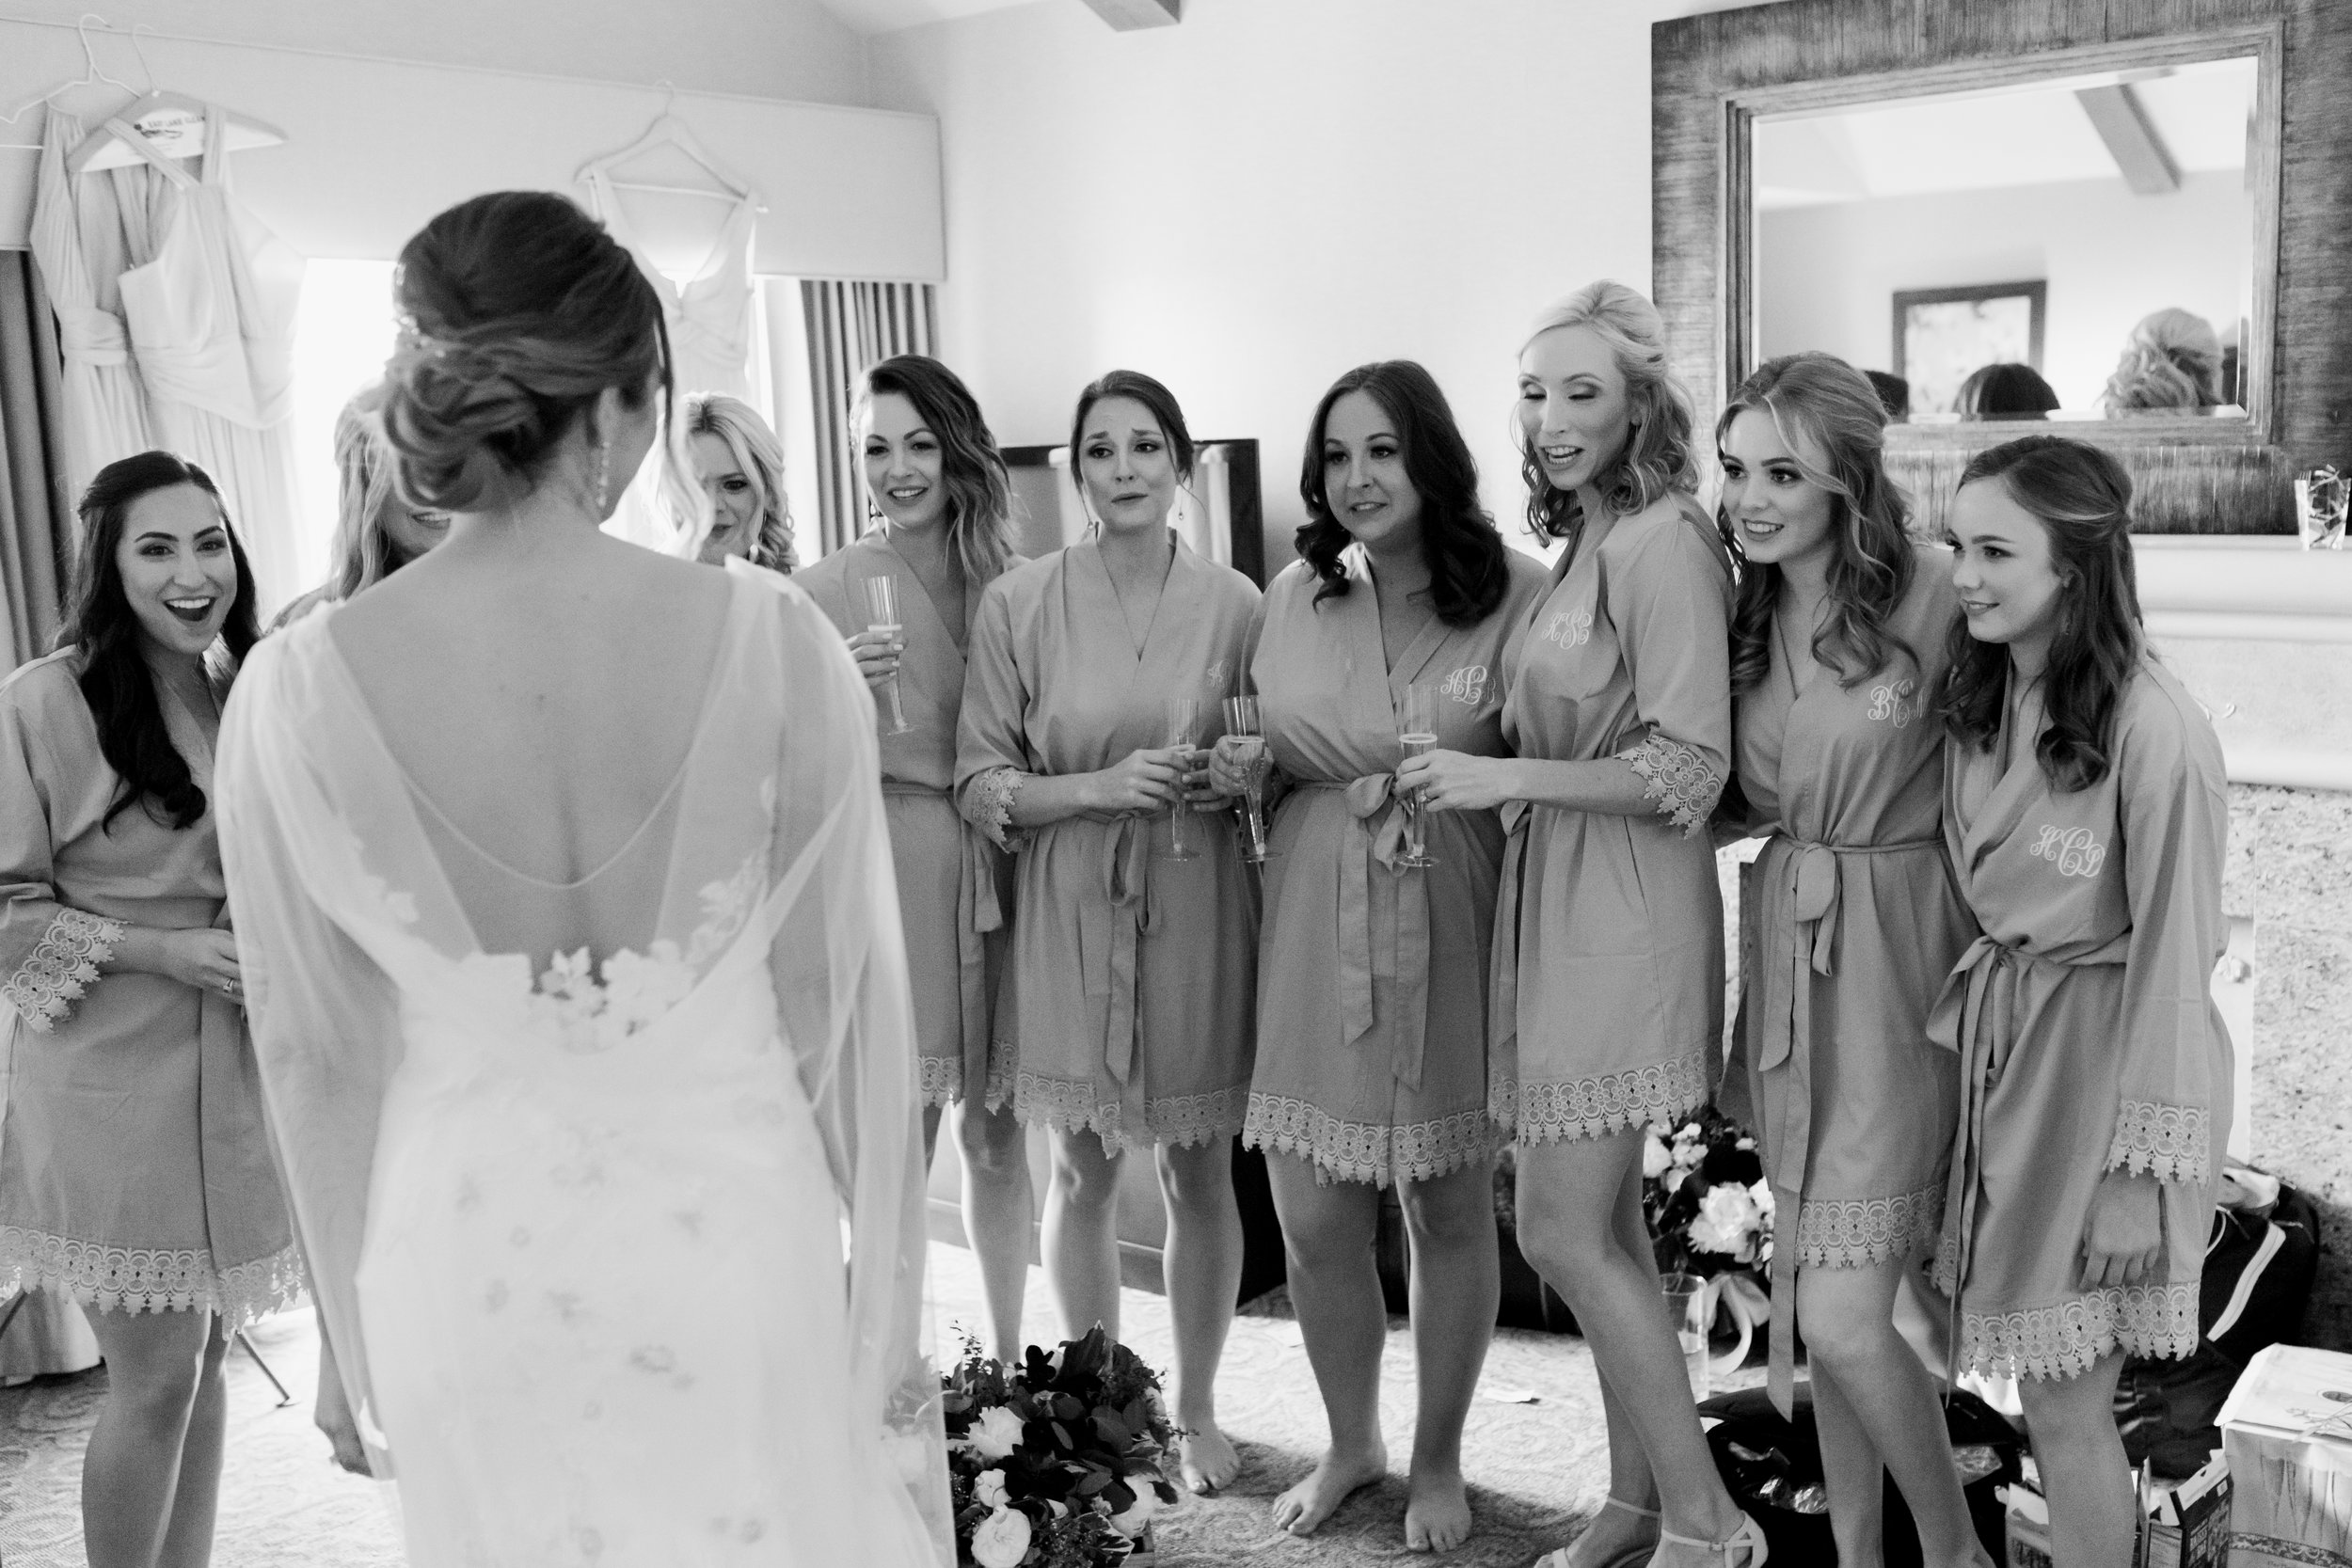 vintners-inn-wedding-in-santa-rosa-california-215.jpg